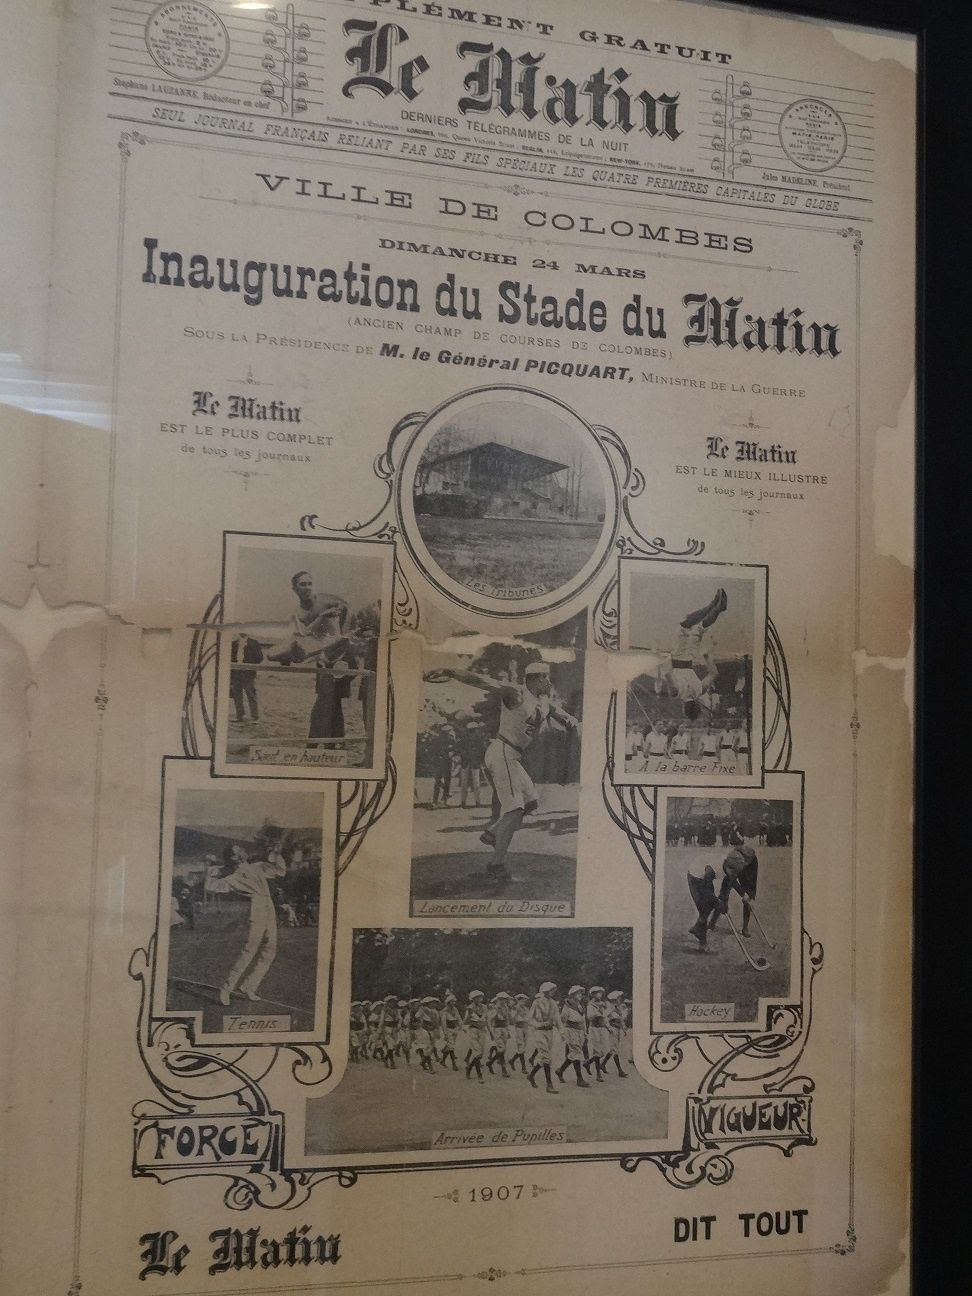 Inauguration du stade du Matin